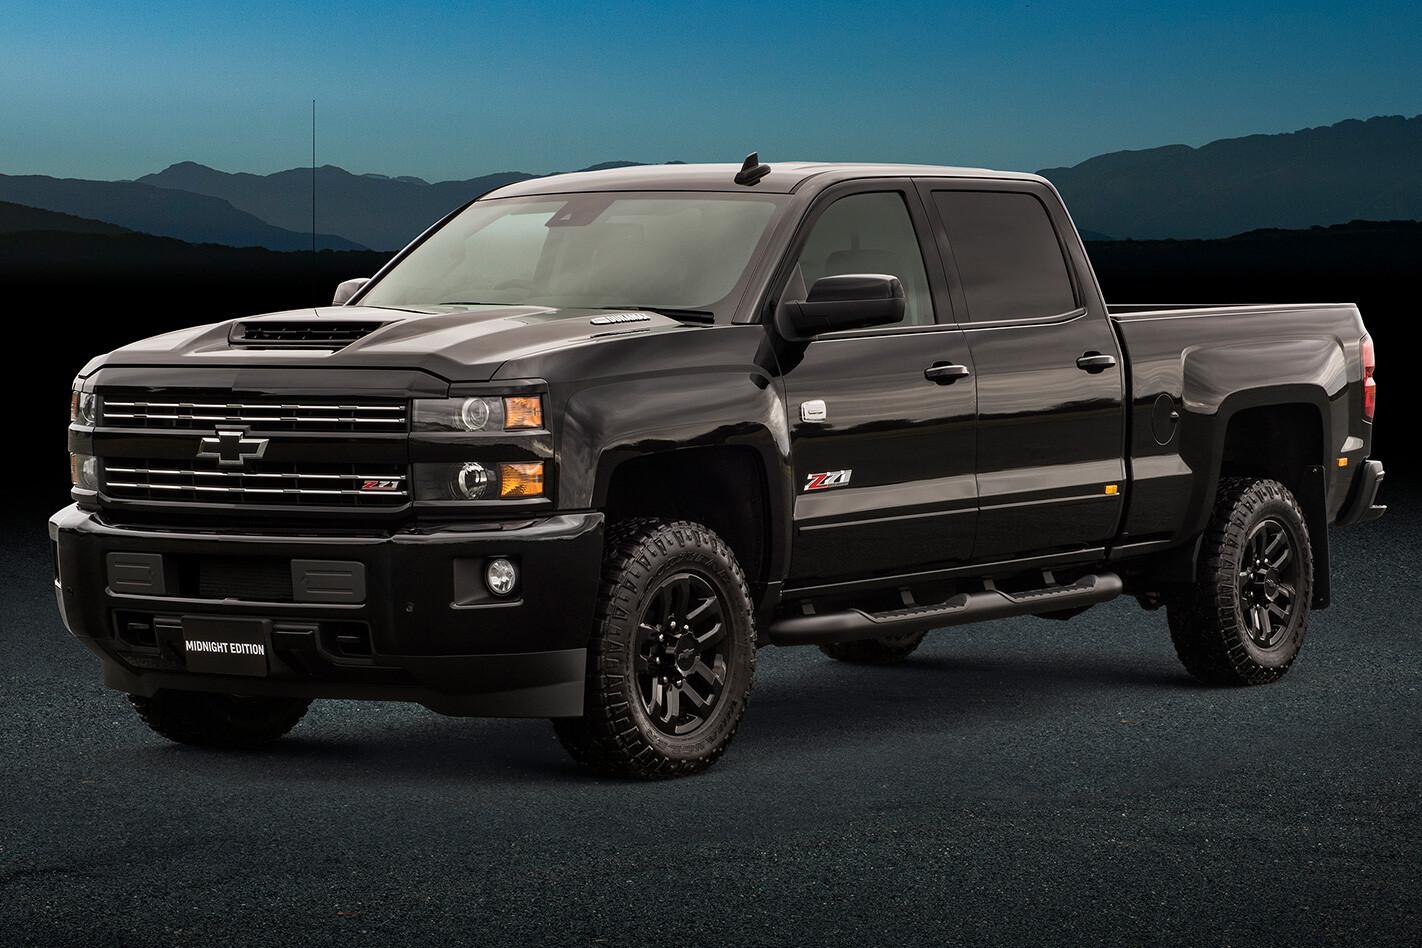 Chevrolet Silverado Black Jpg